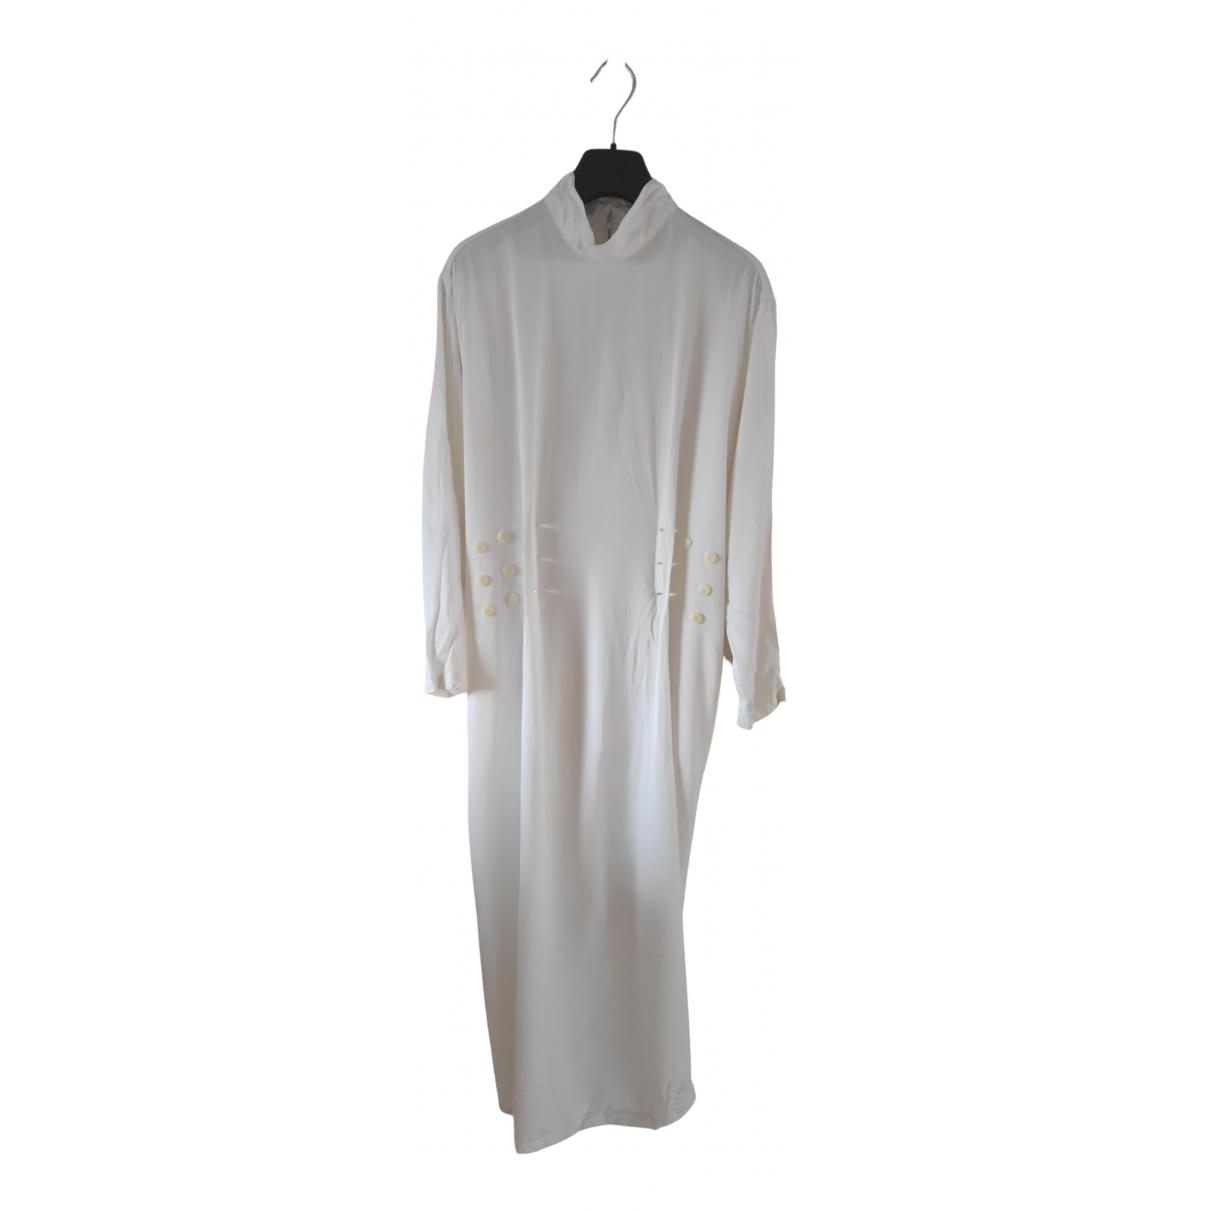 Ann Demeulemeester \N Kleid in  Weiss Viskose